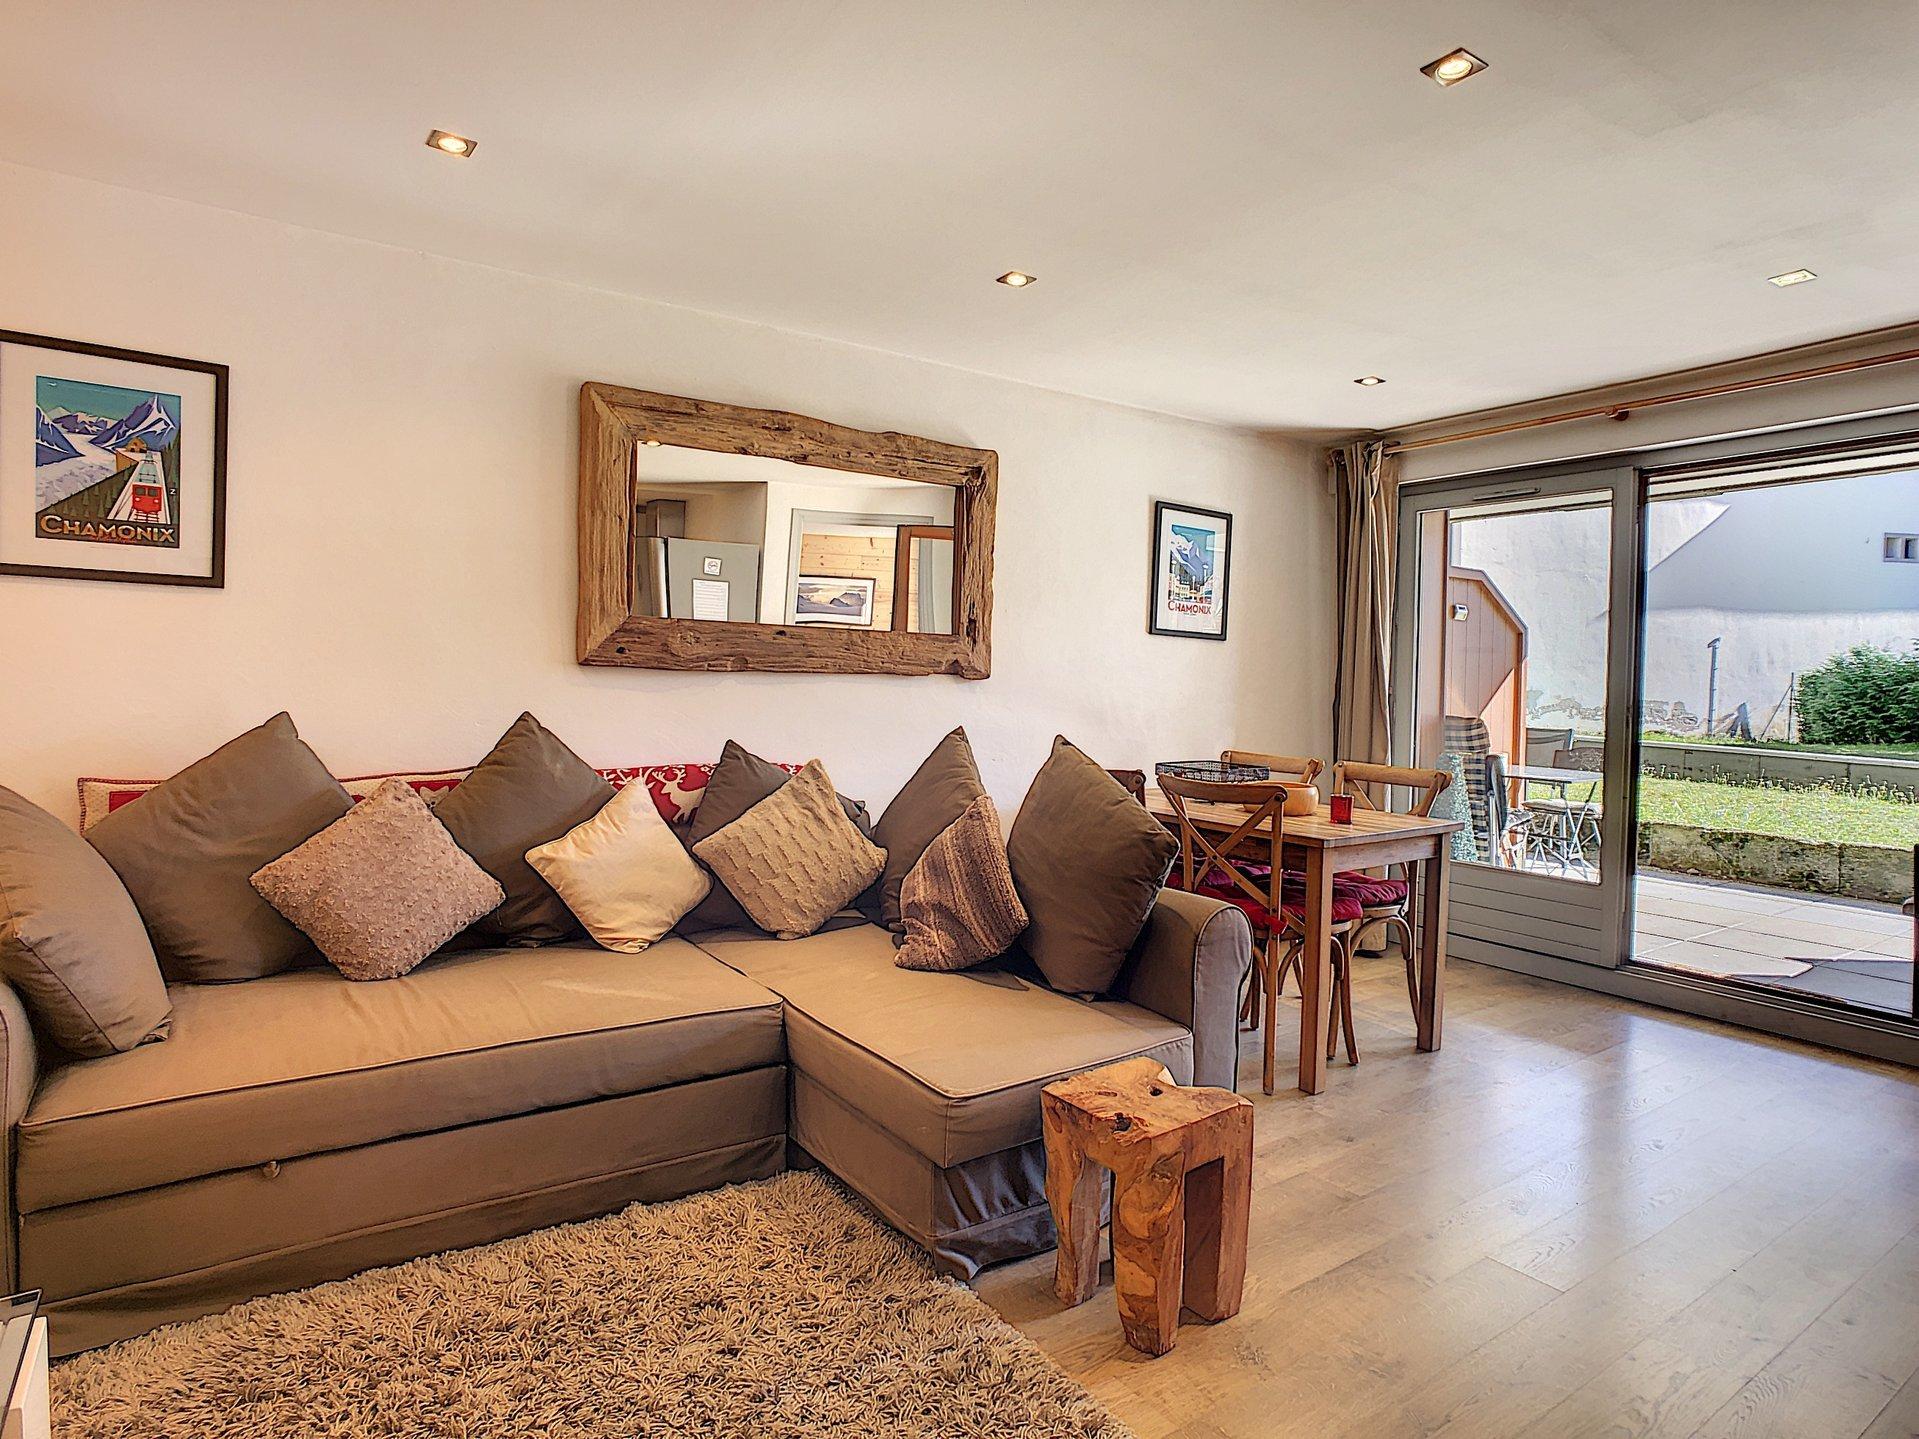 Appartement 1 chambre, Chamonix-Mont-Blanc